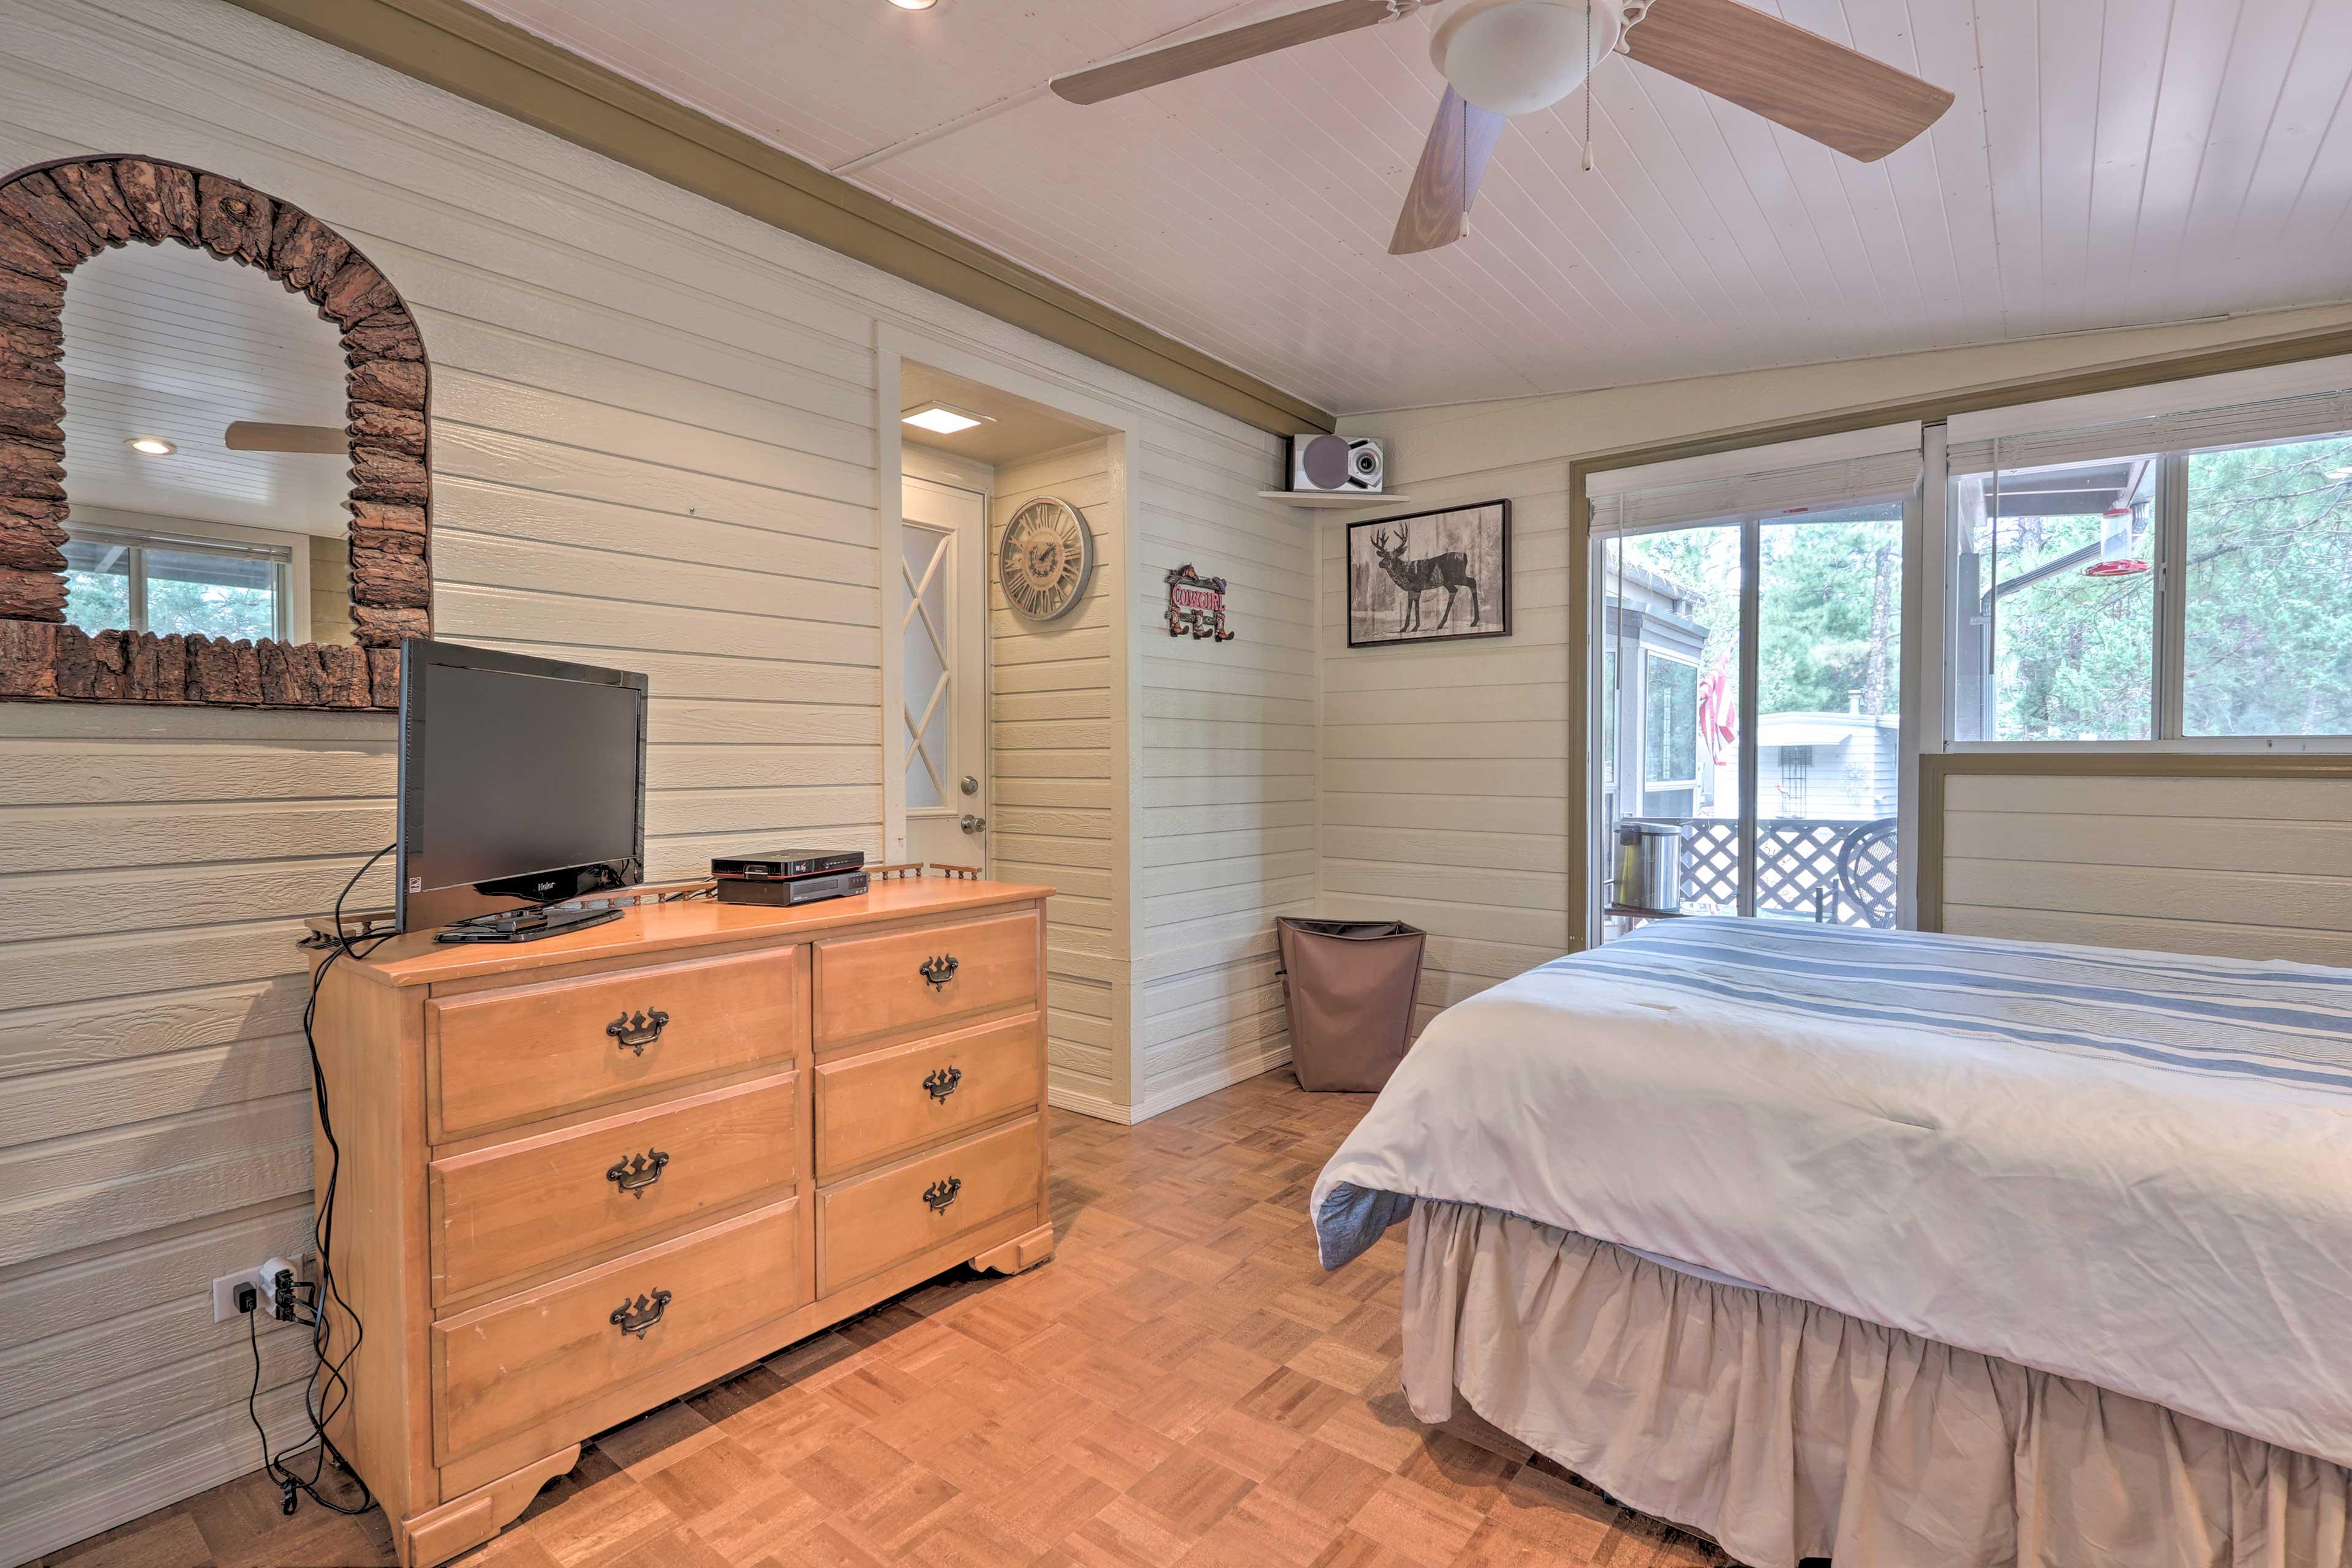 Natural light fills the second bedroom each morning.